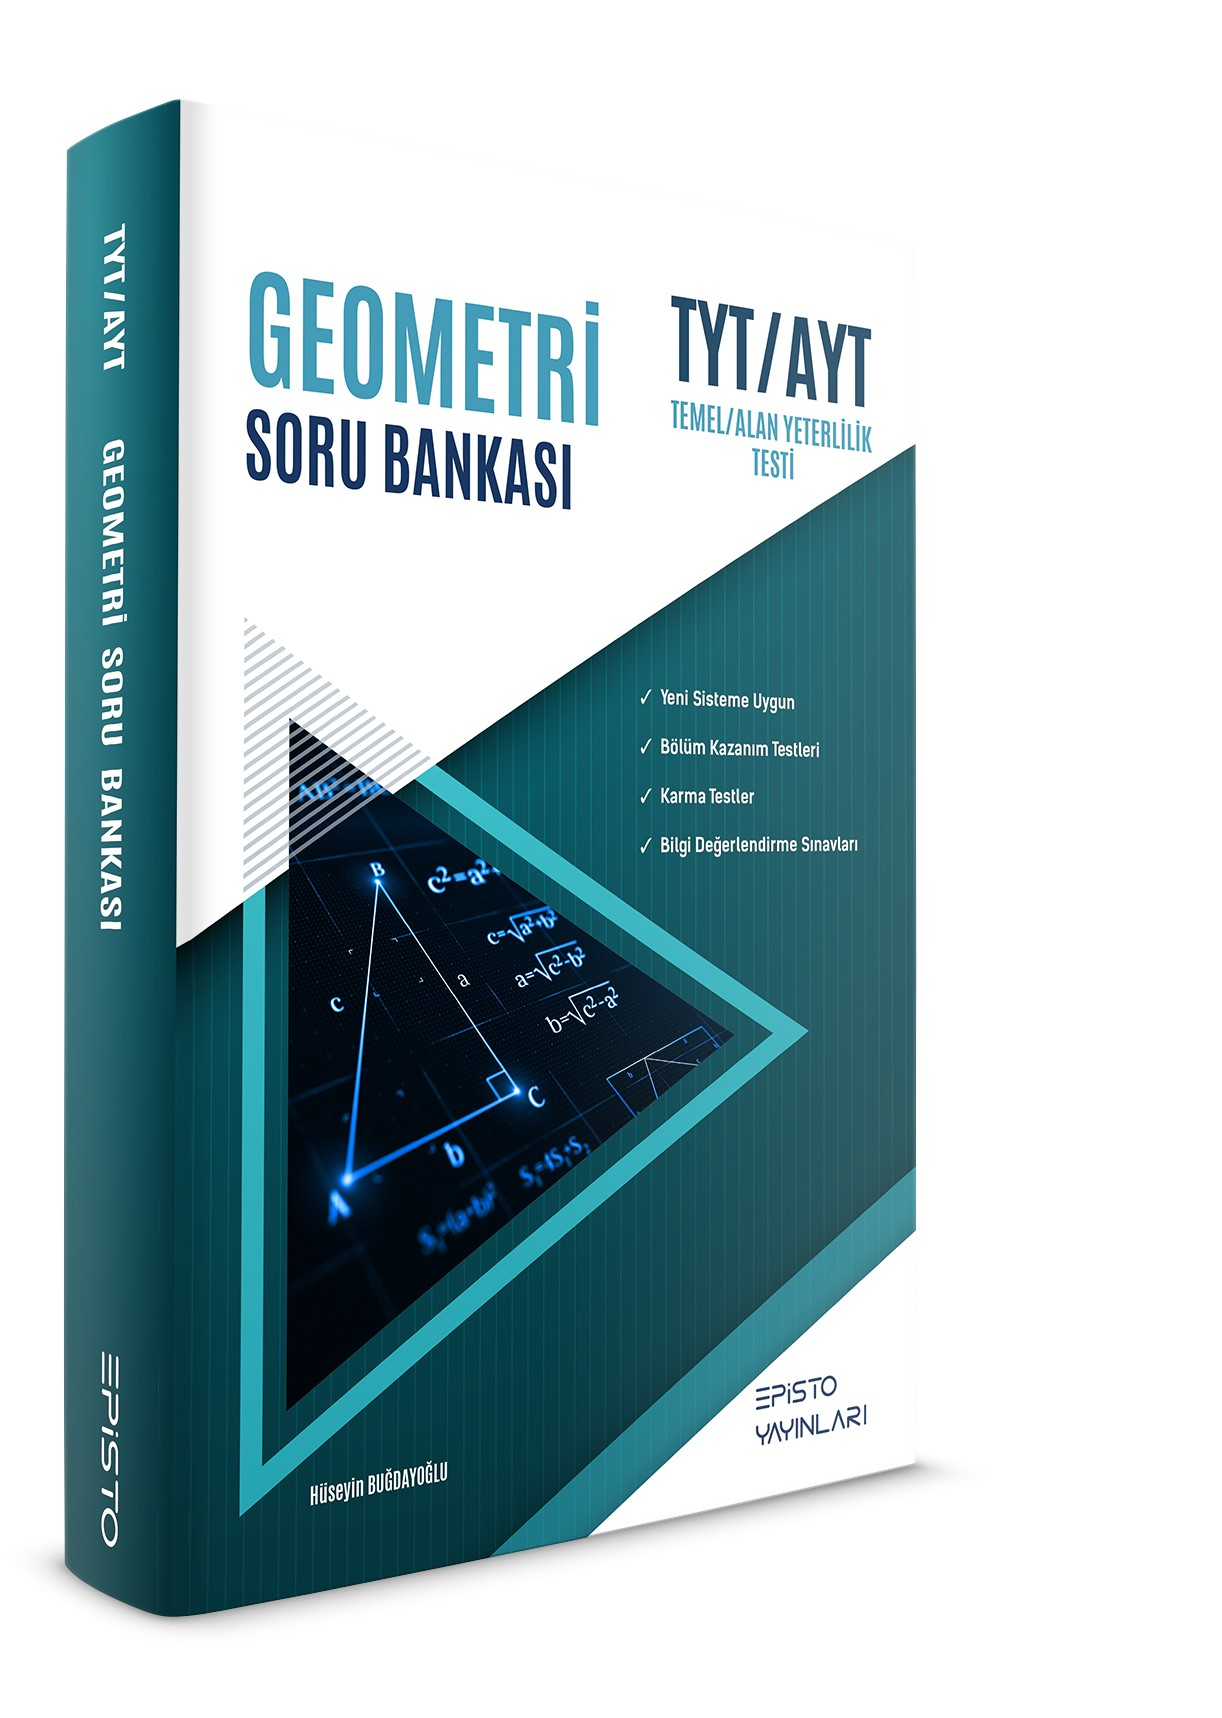 EPİSTO TYT/AYT GEOMETRİ SORU BANKASI